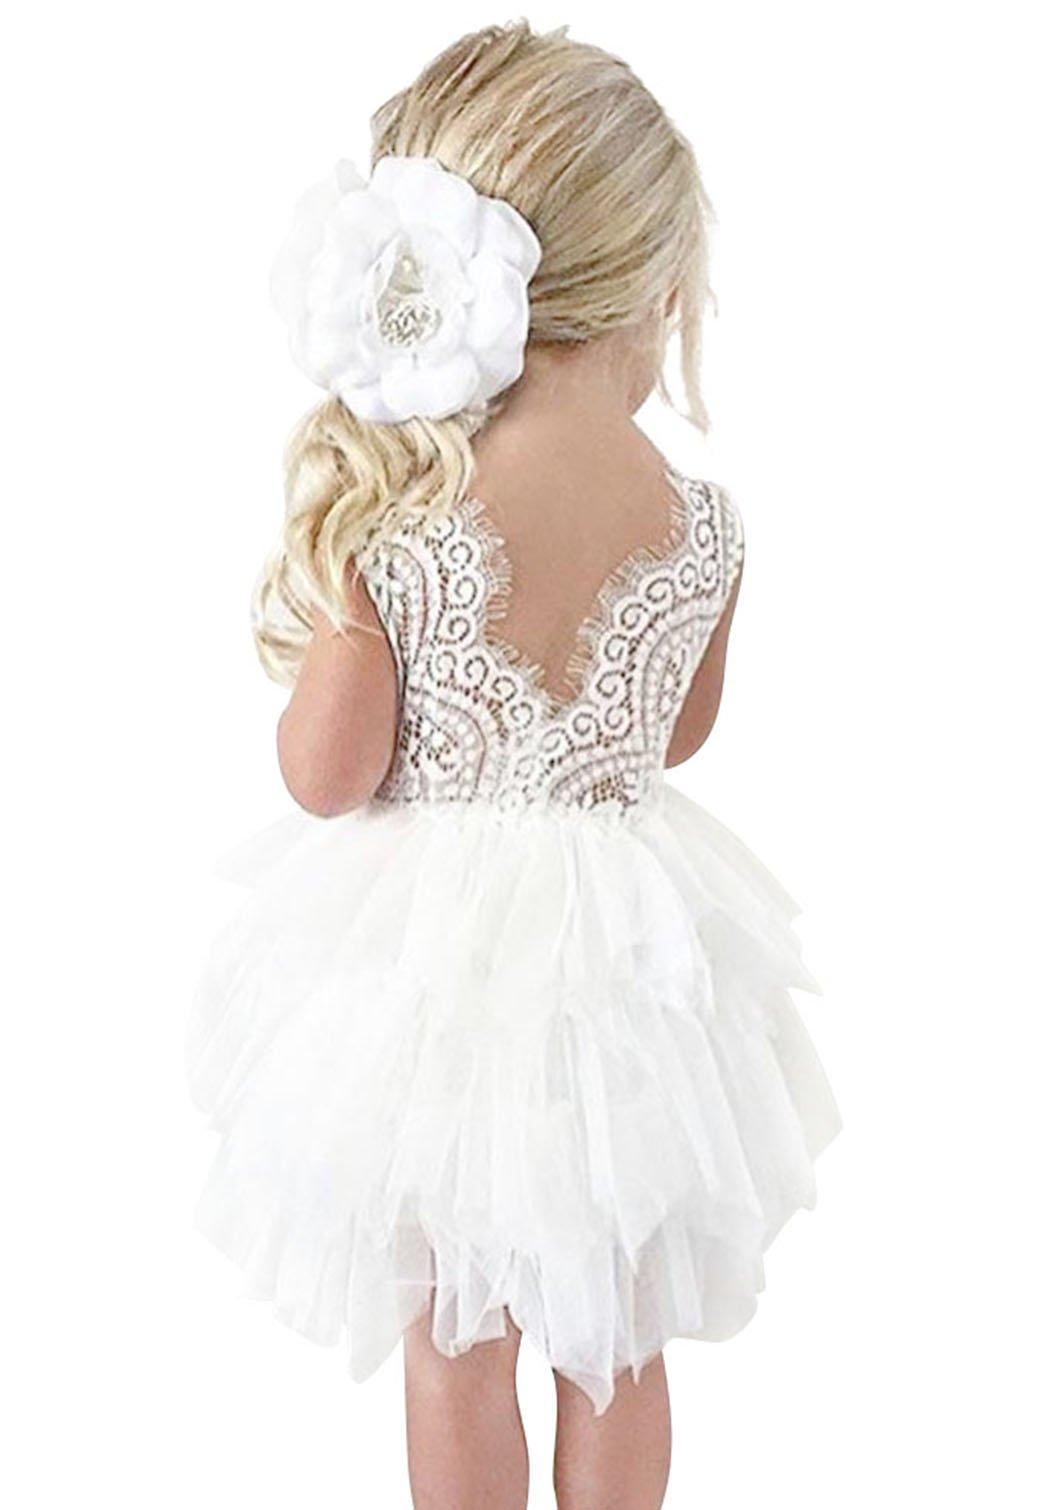 AmzBarley Little Girls Tutu Dress Backless Flower Girls Dresses Age 1-2 Years White Size 3T